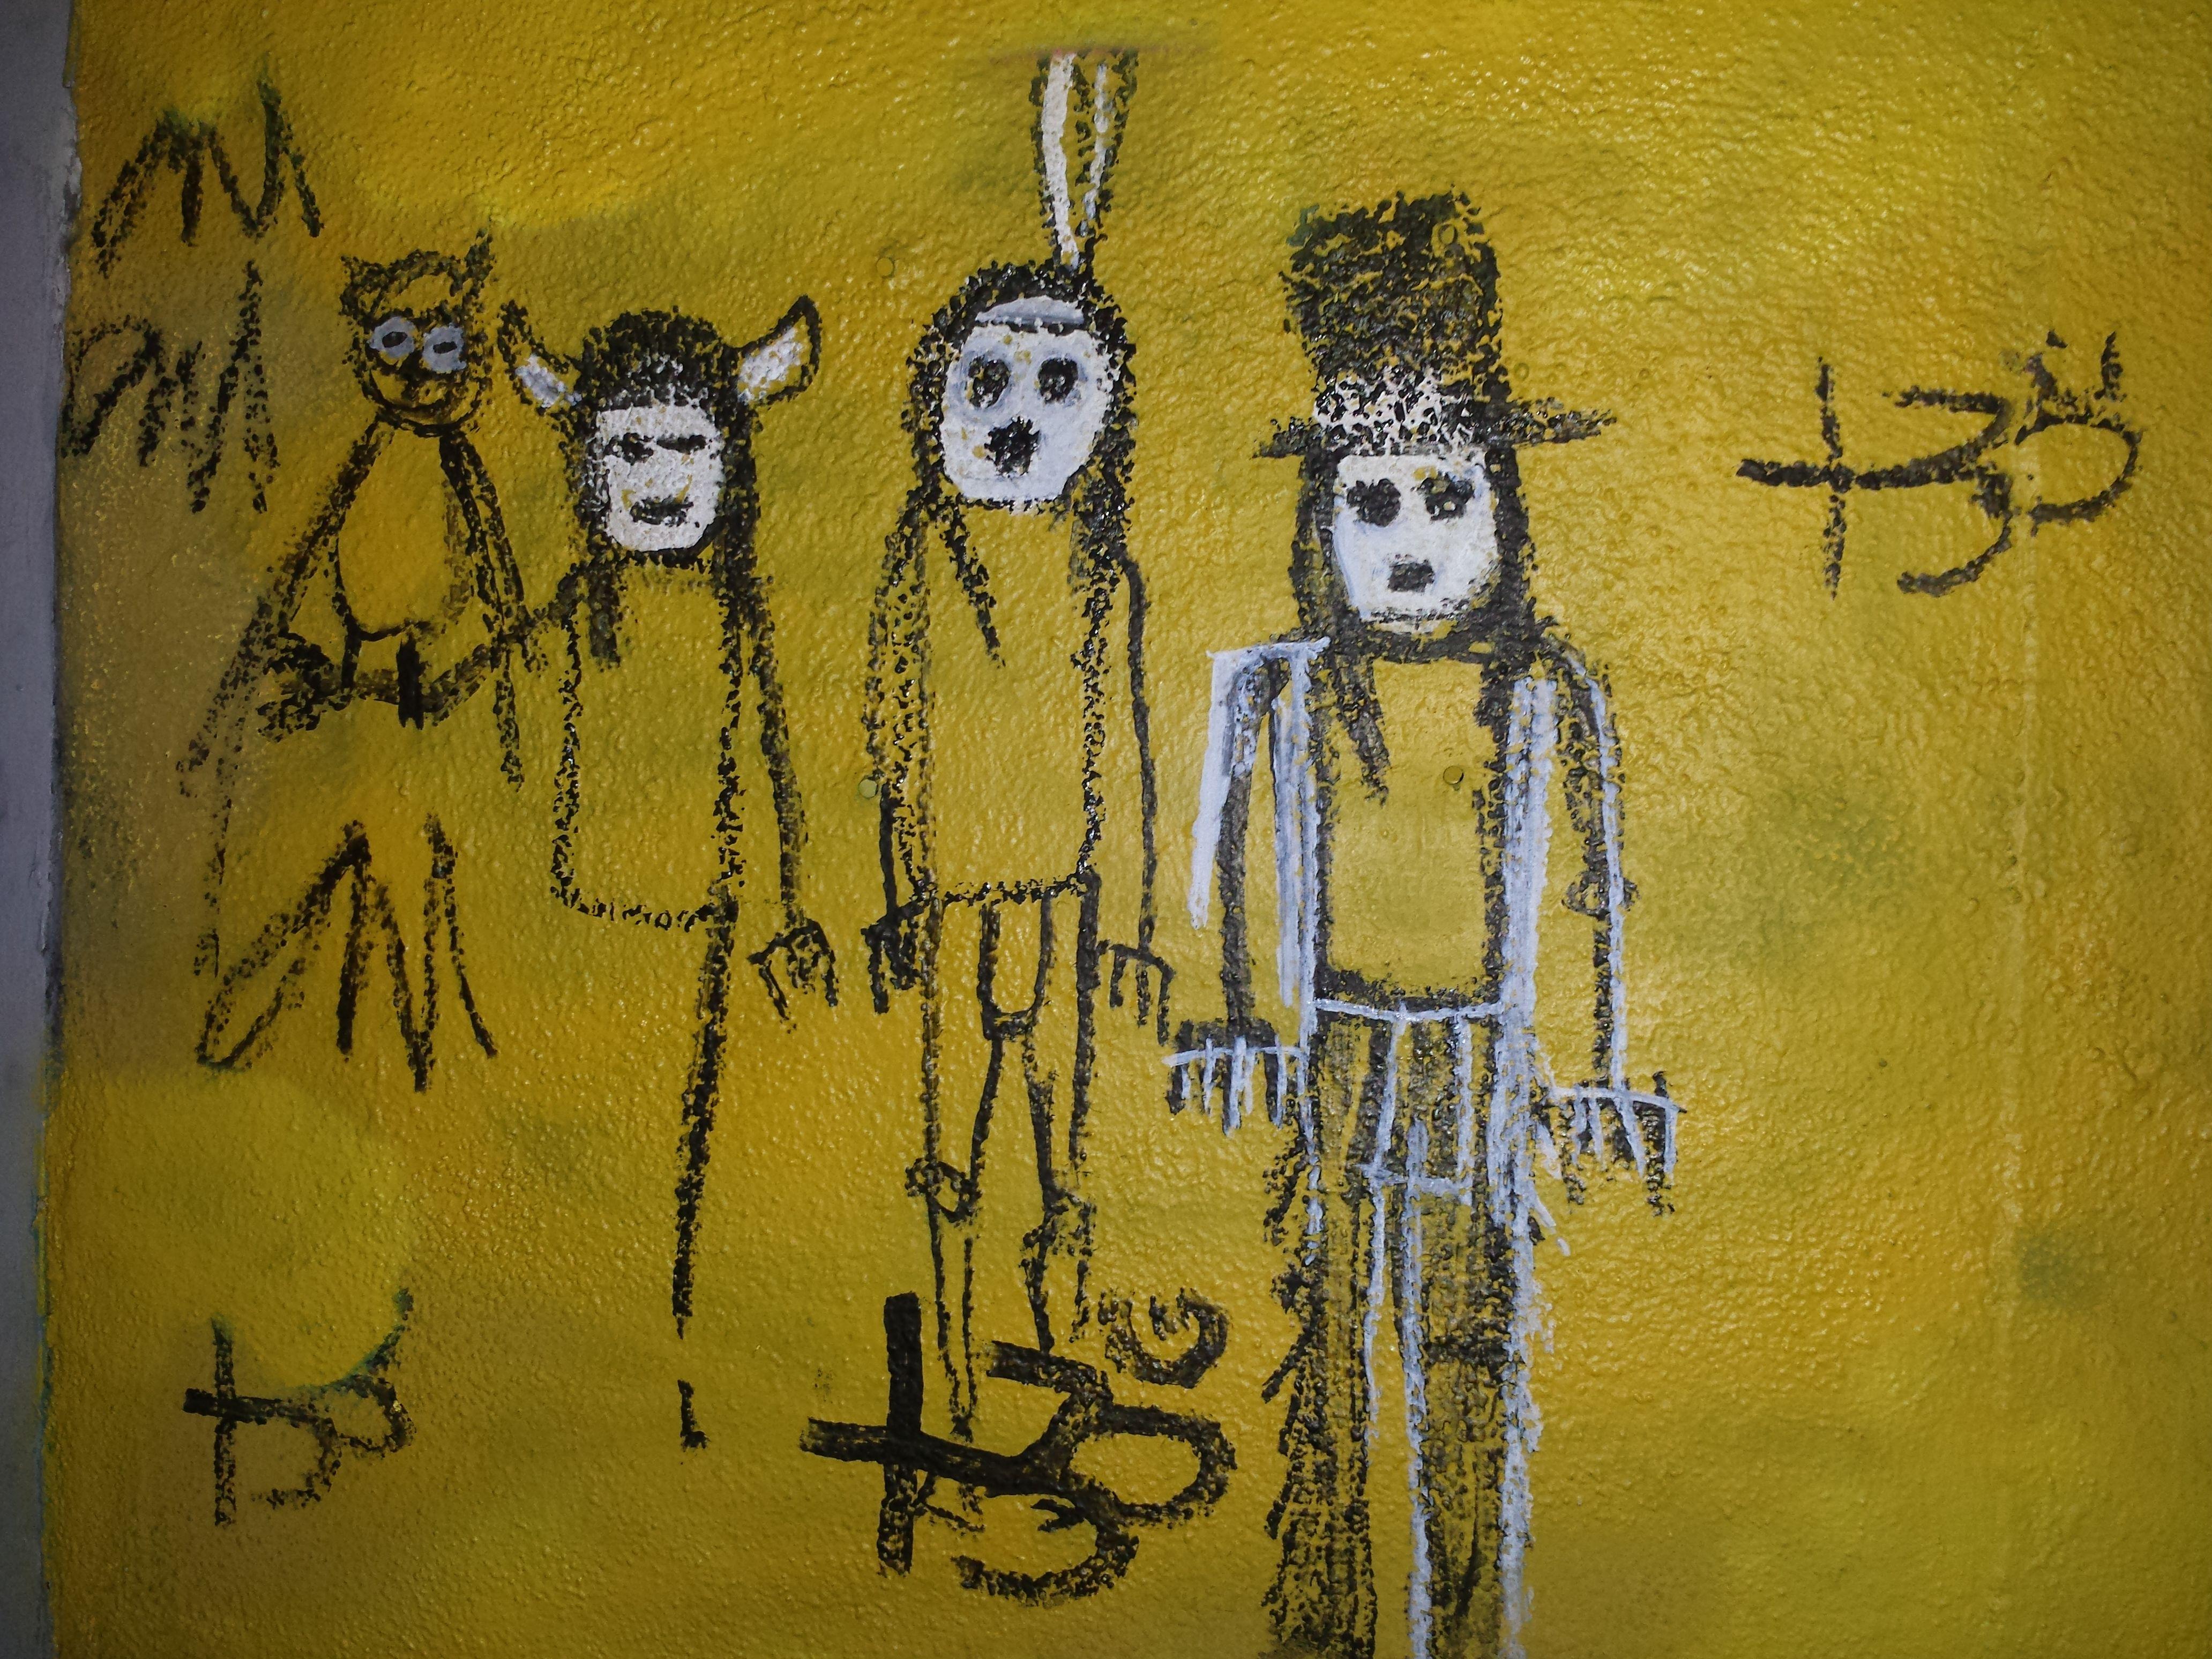 LA art is creepy and weird, but I love it! Seen scrawled on a random ...